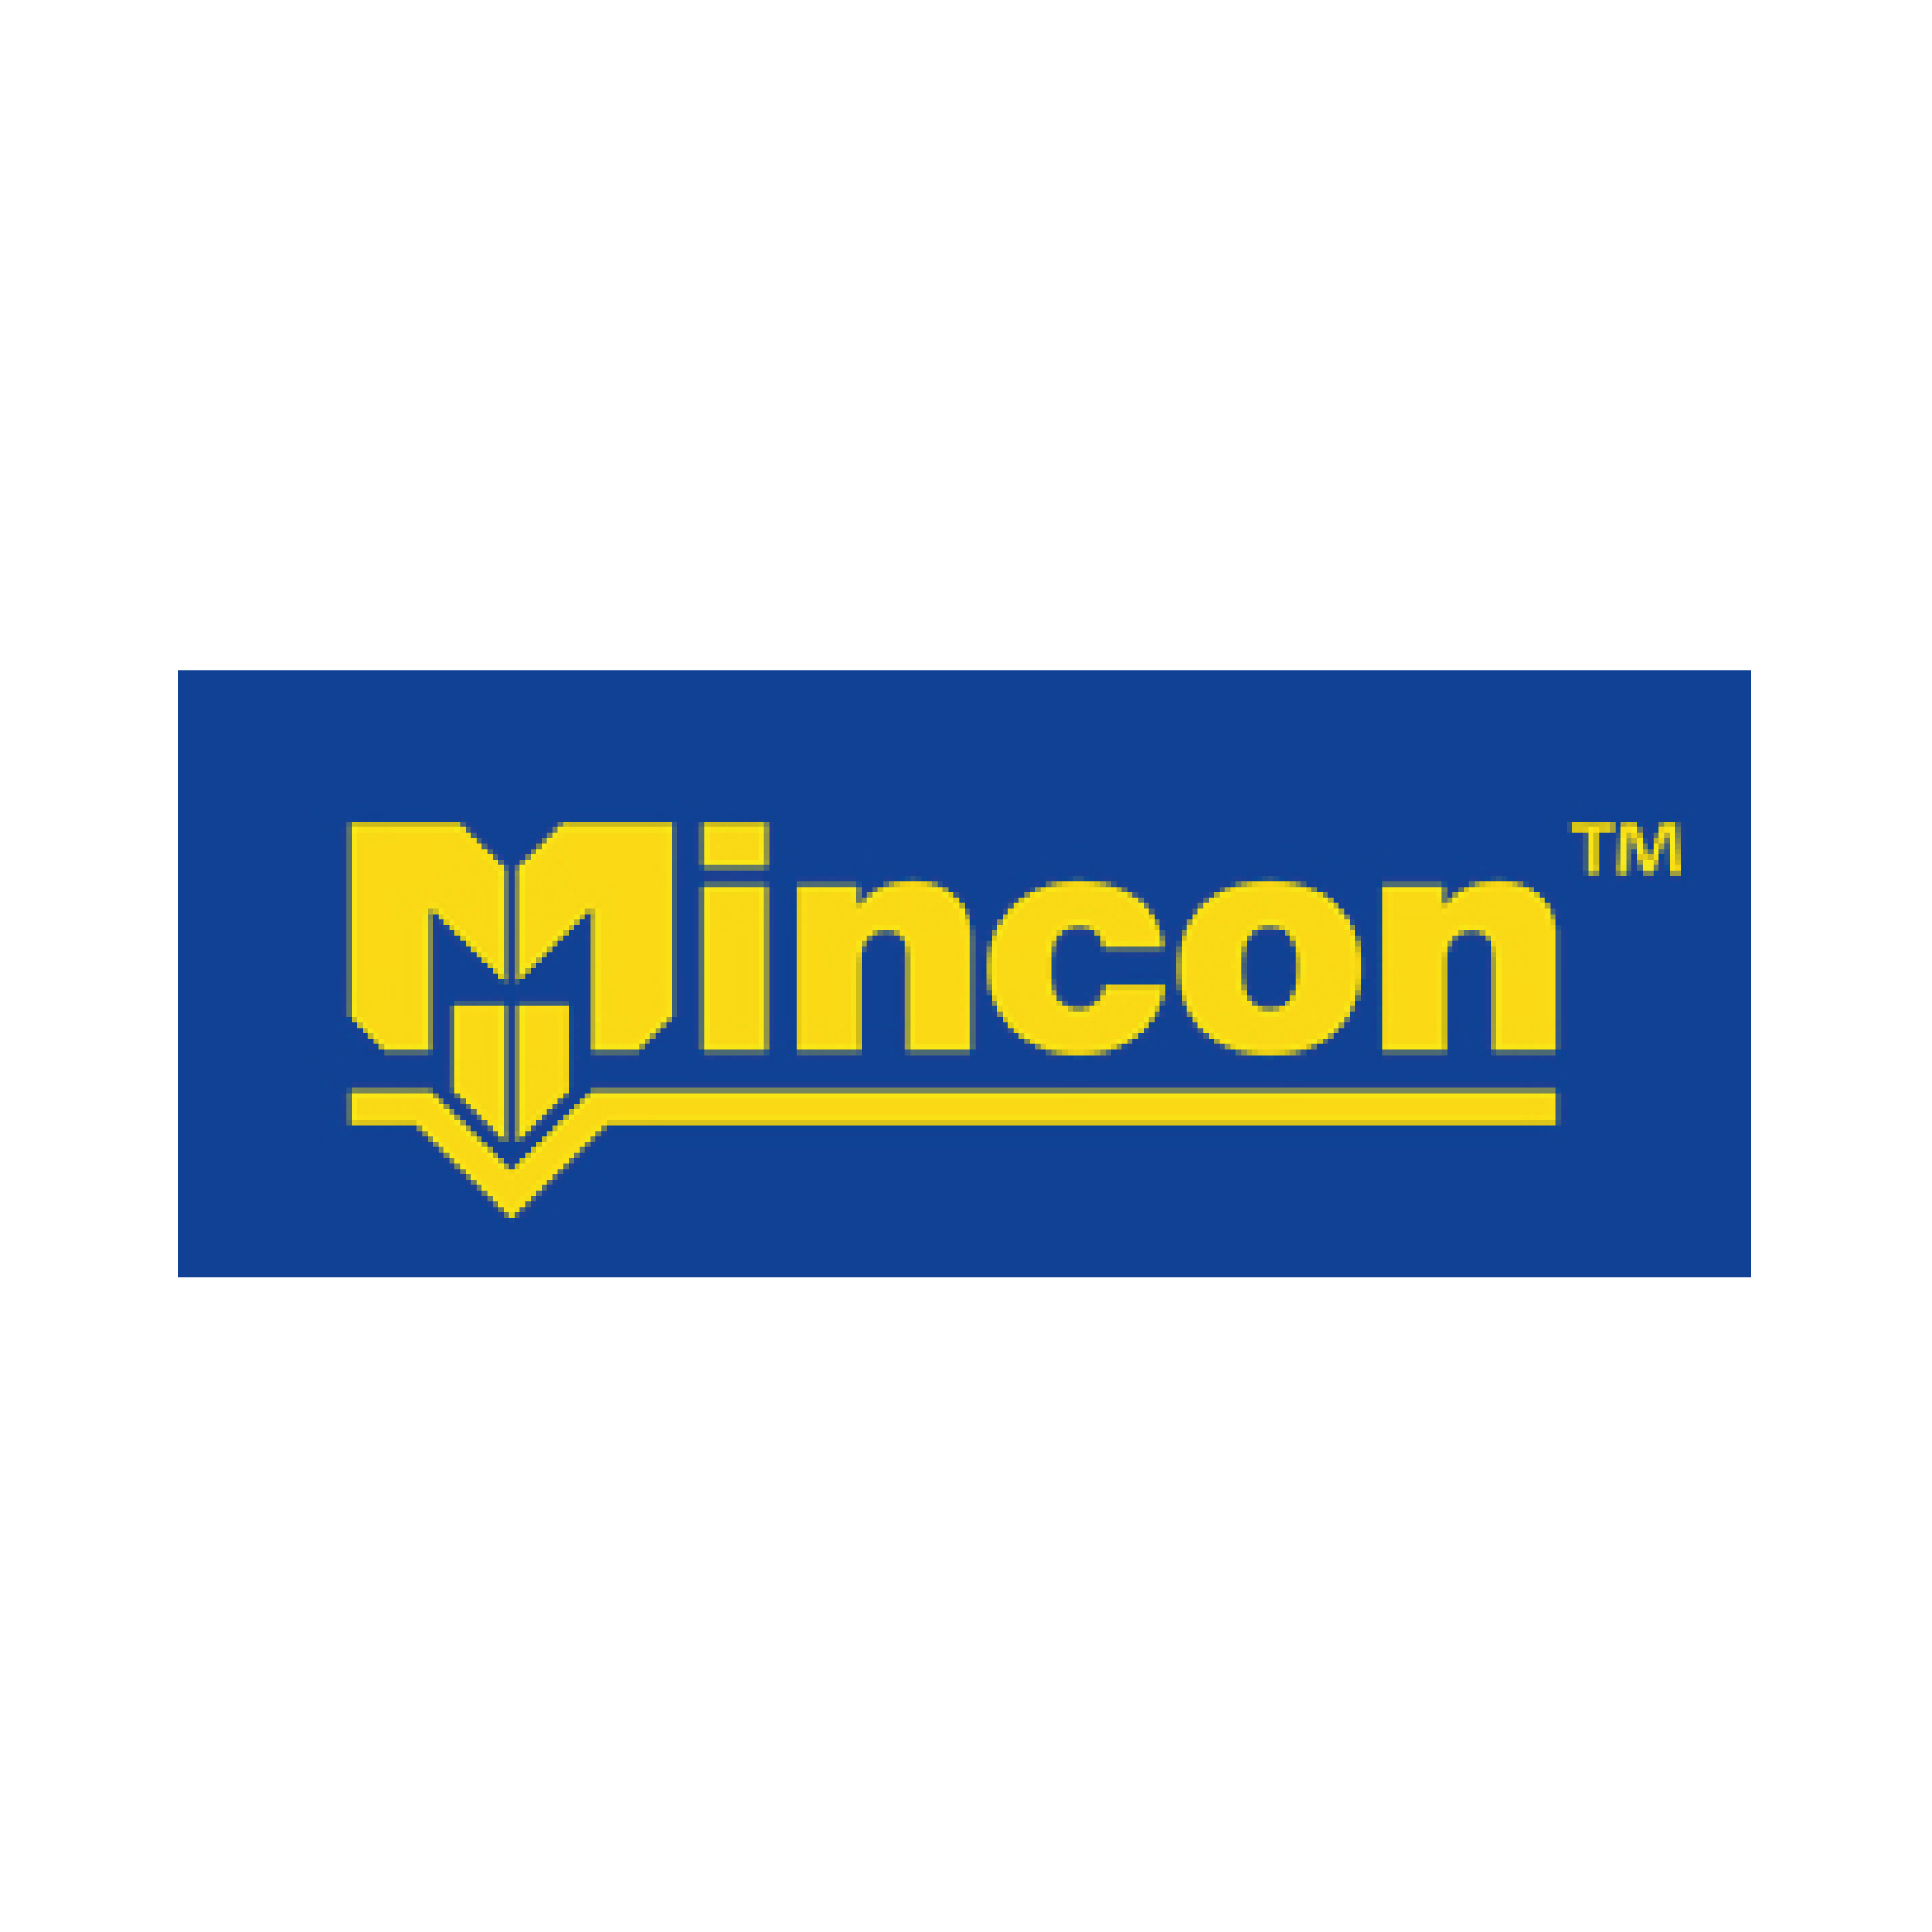 mincon_logo-01.jpg